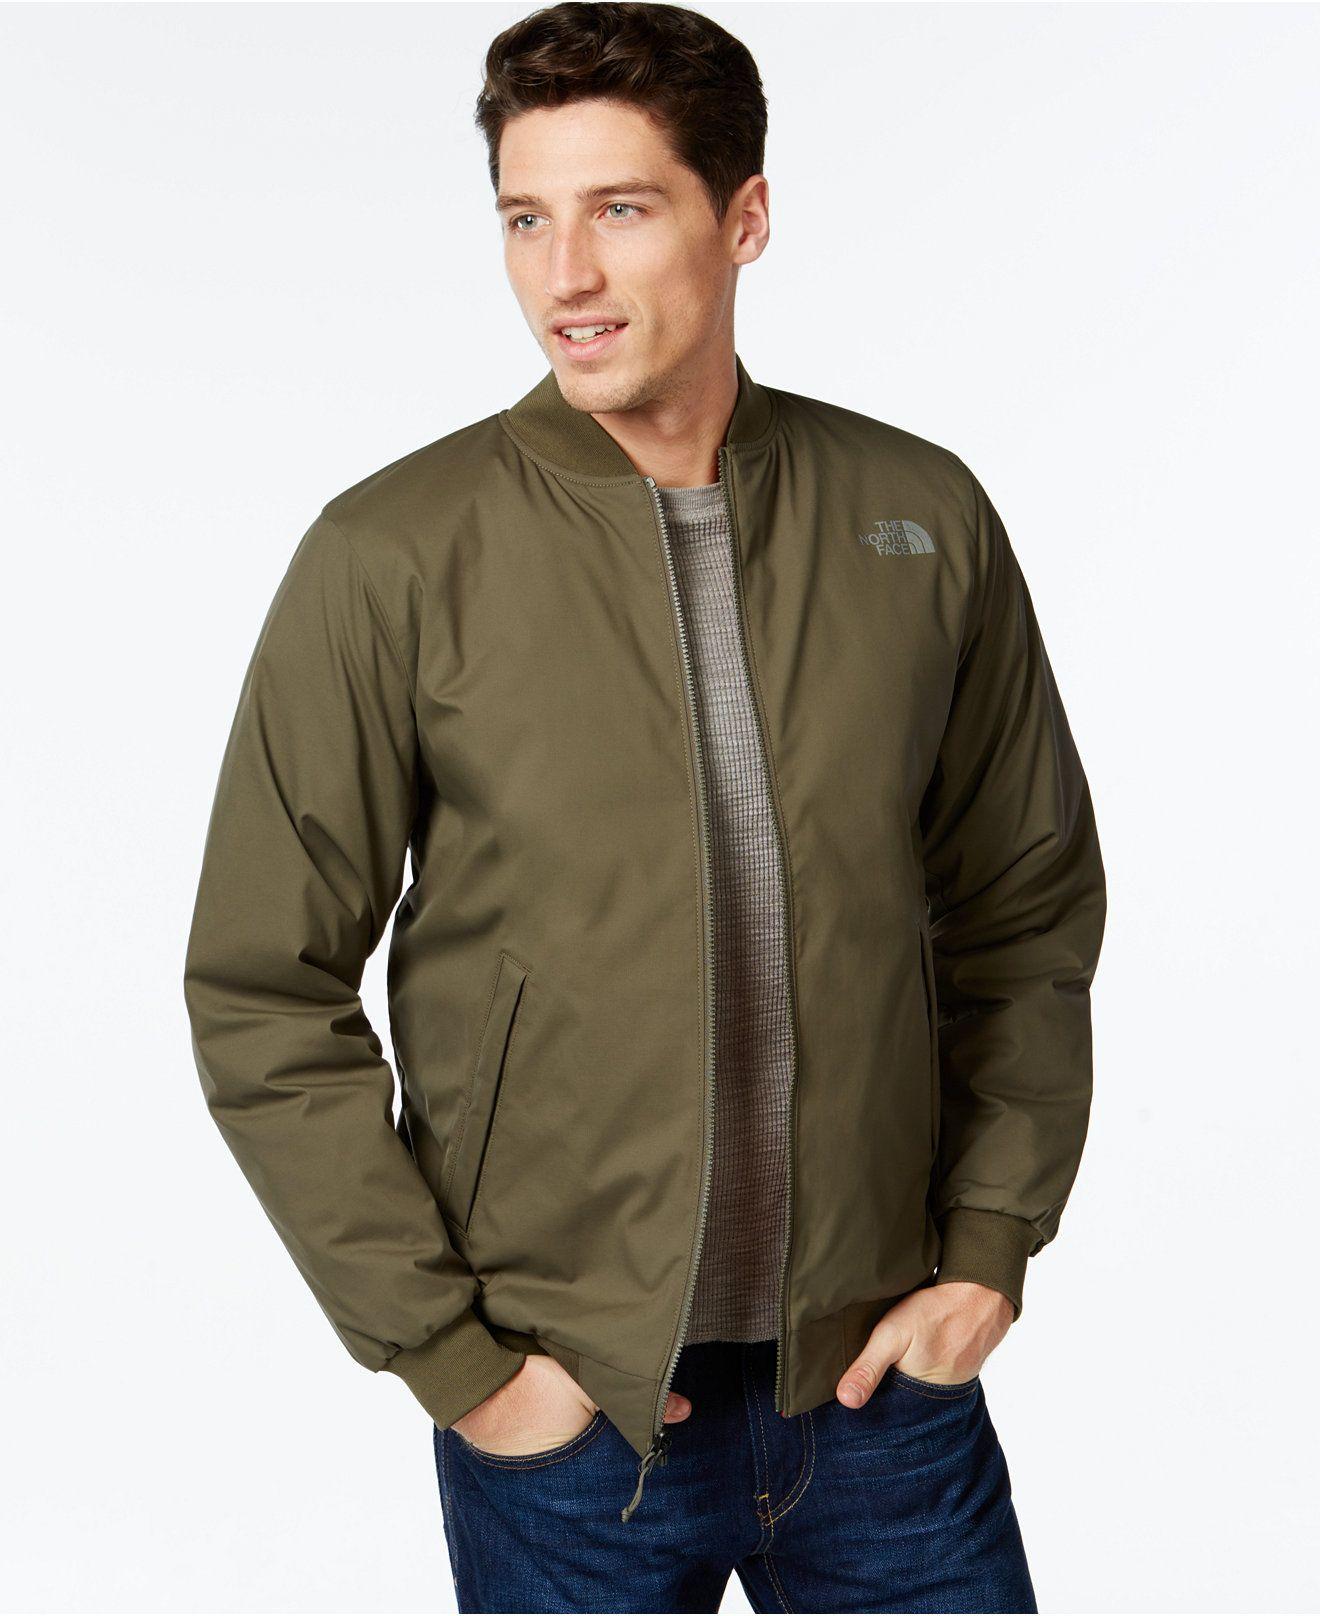 The North Face Woodside Jacket Coats Jackets Men Macy S North Face Bomber Jacket Jackets Mens Jackets [ 1616 x 1320 Pixel ]